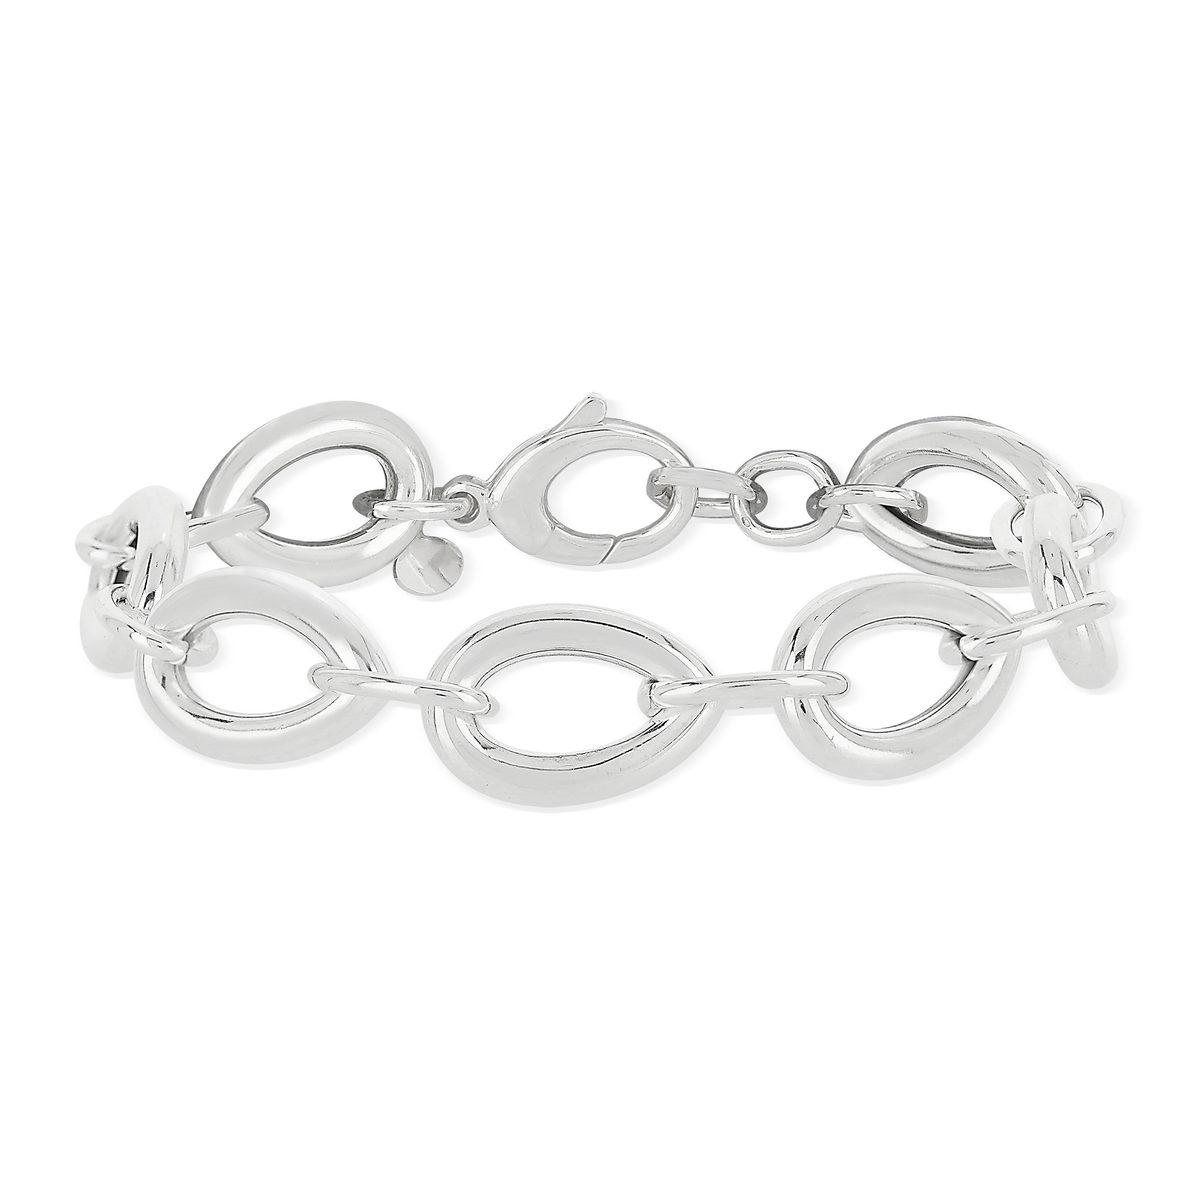 bracelet femme argent 21 cm